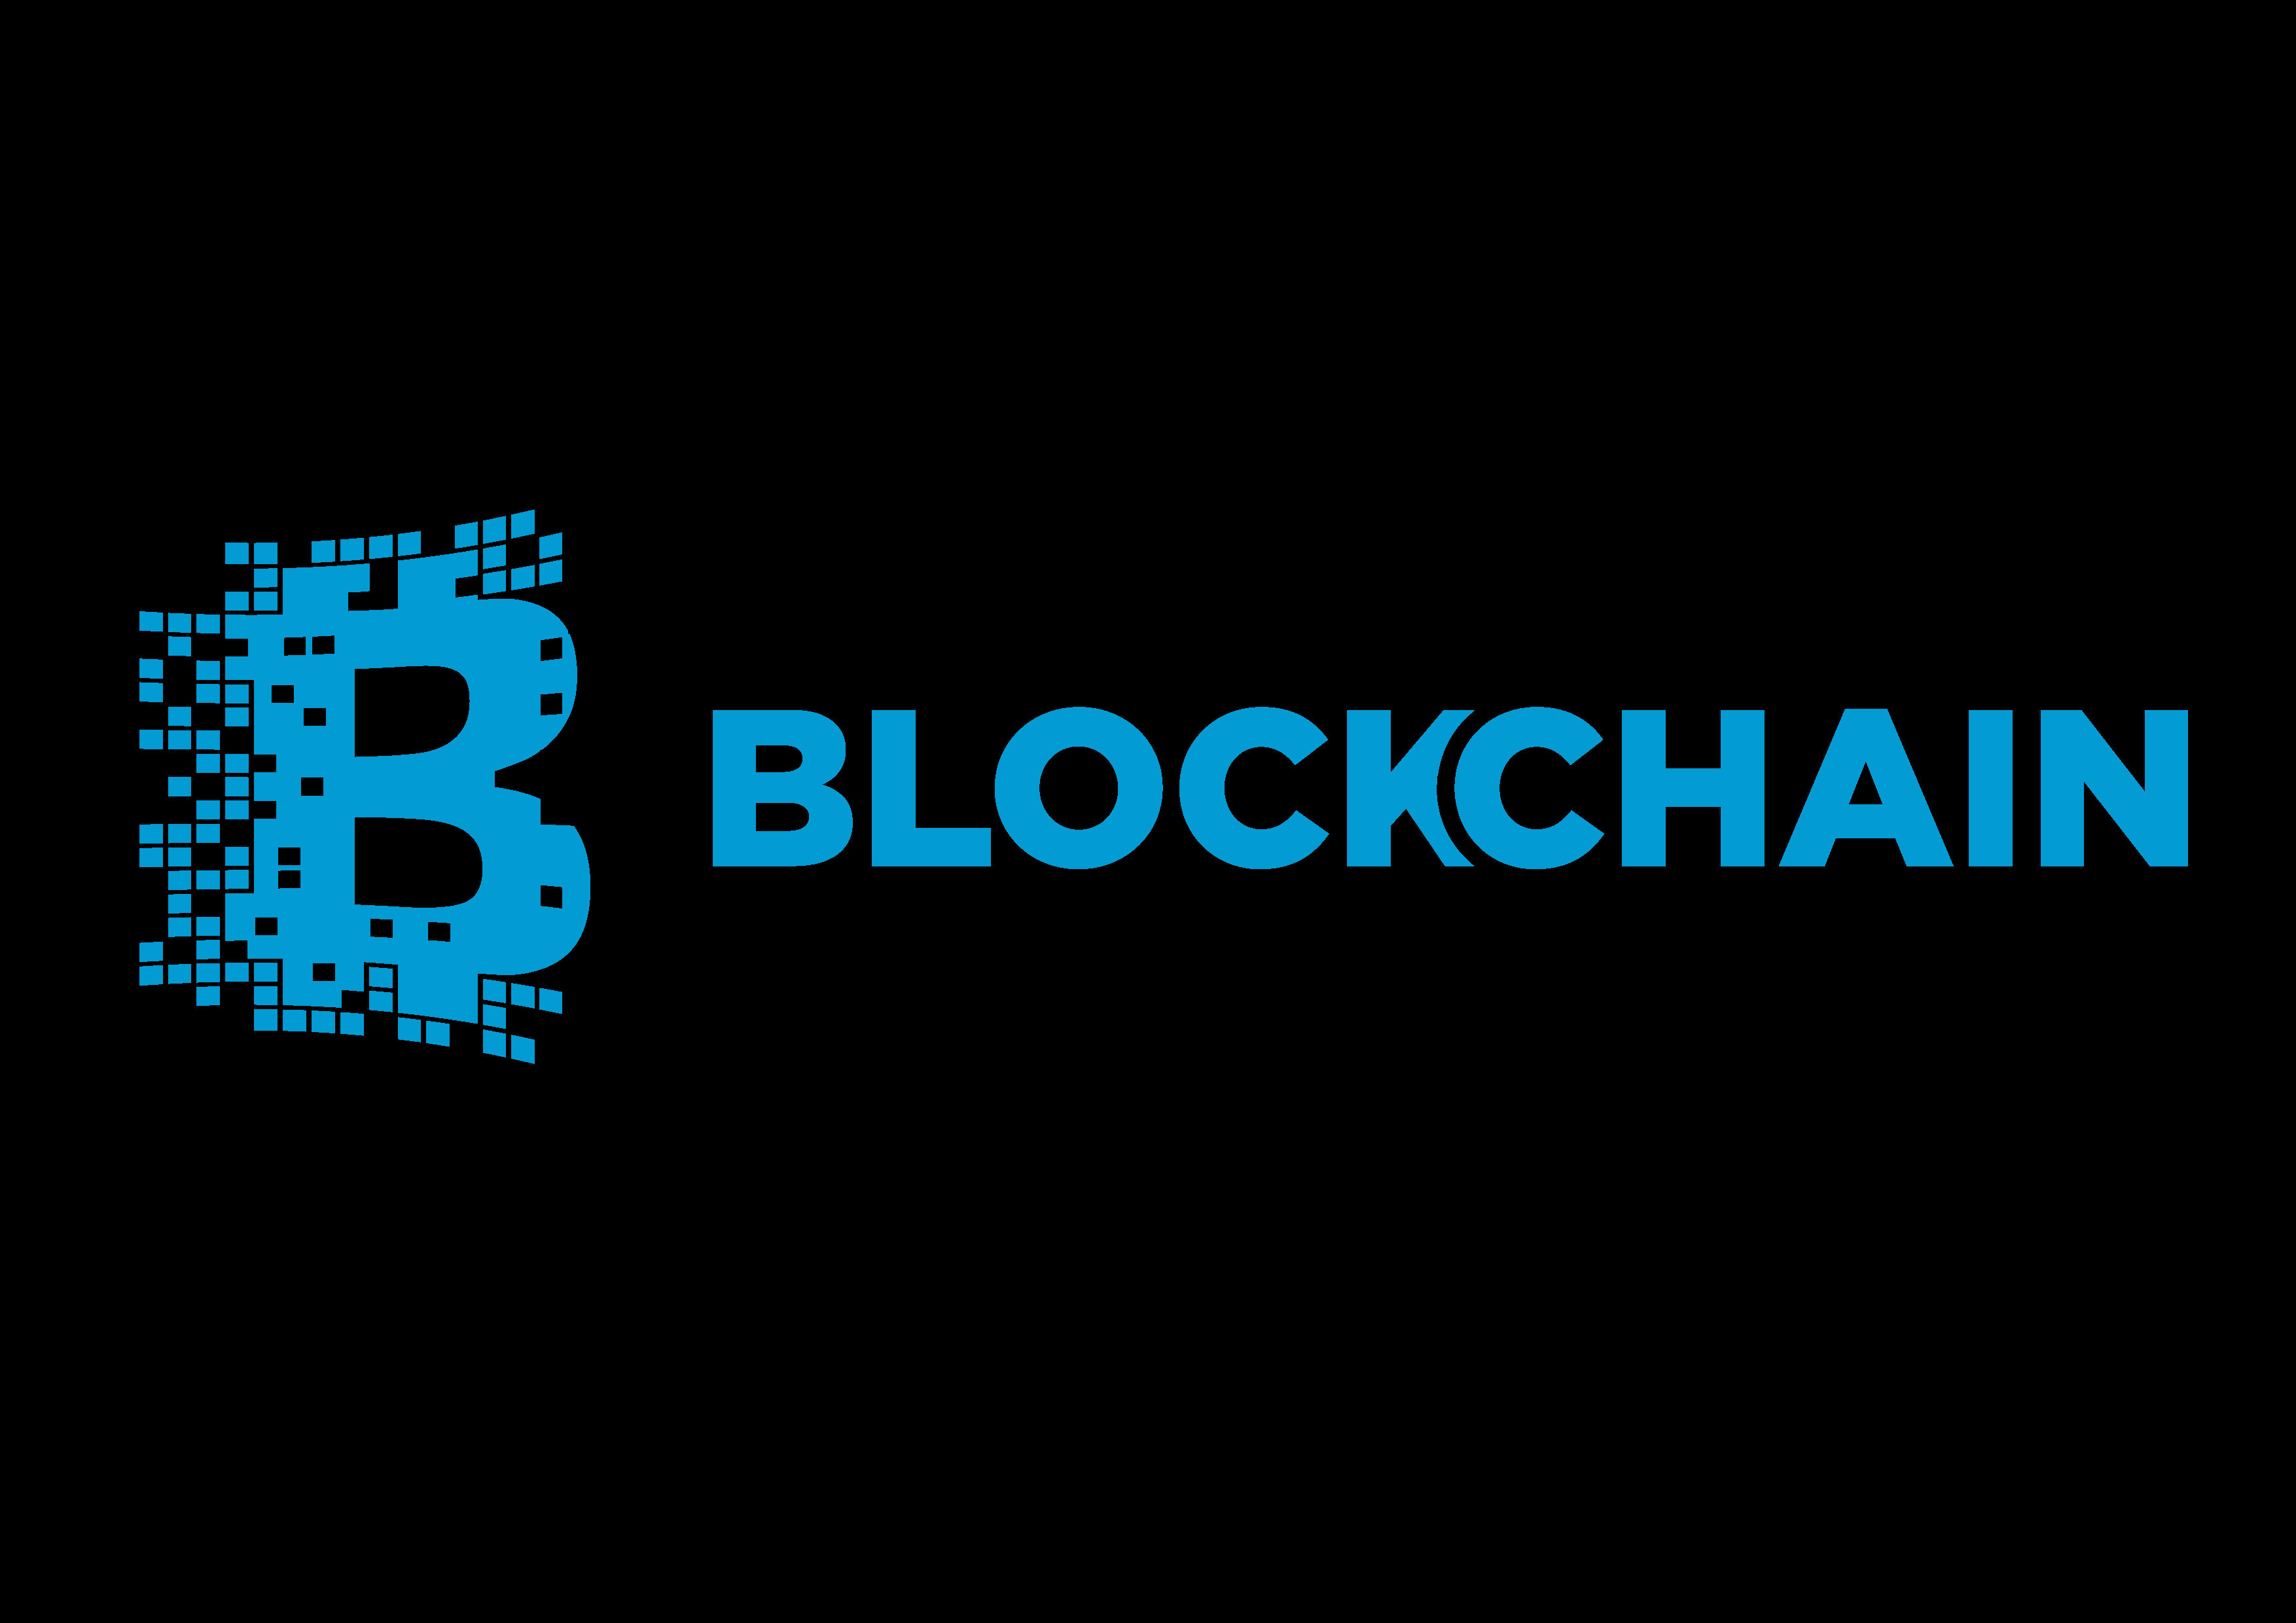 blockchain_info_logo.jpg